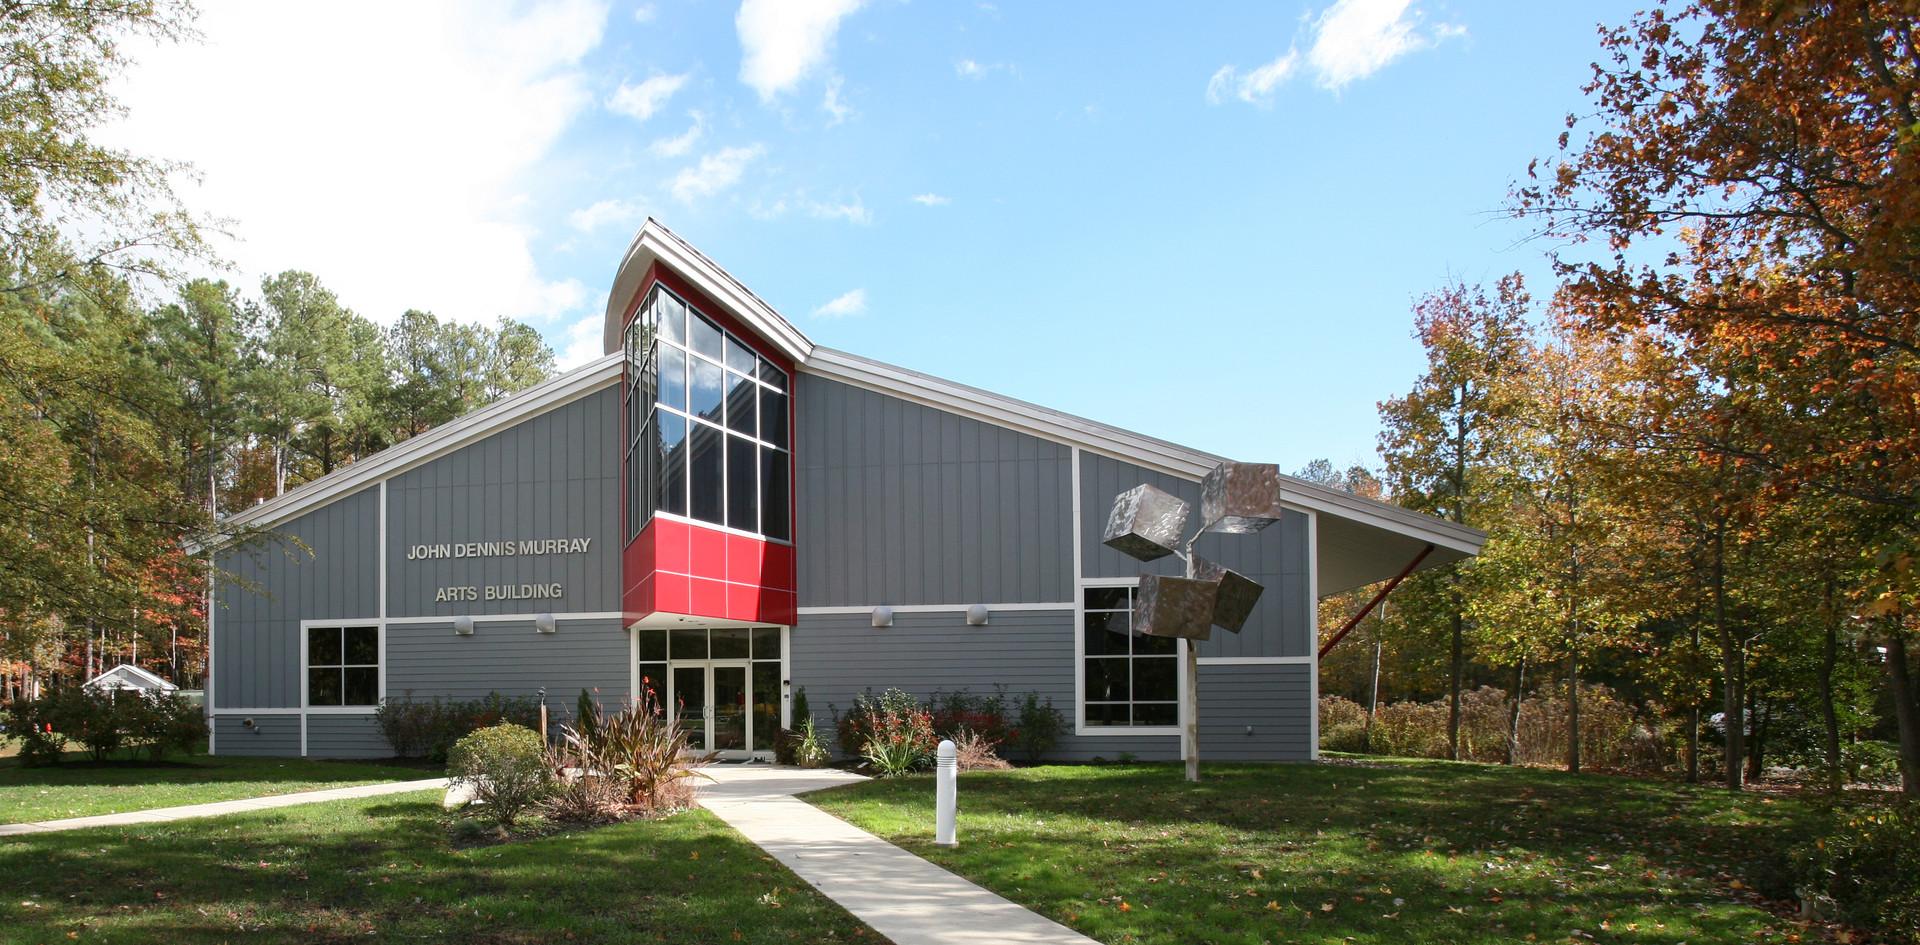 John Dennis Murray Arts Building and Annmarie Sculpture Garden and Arts Center